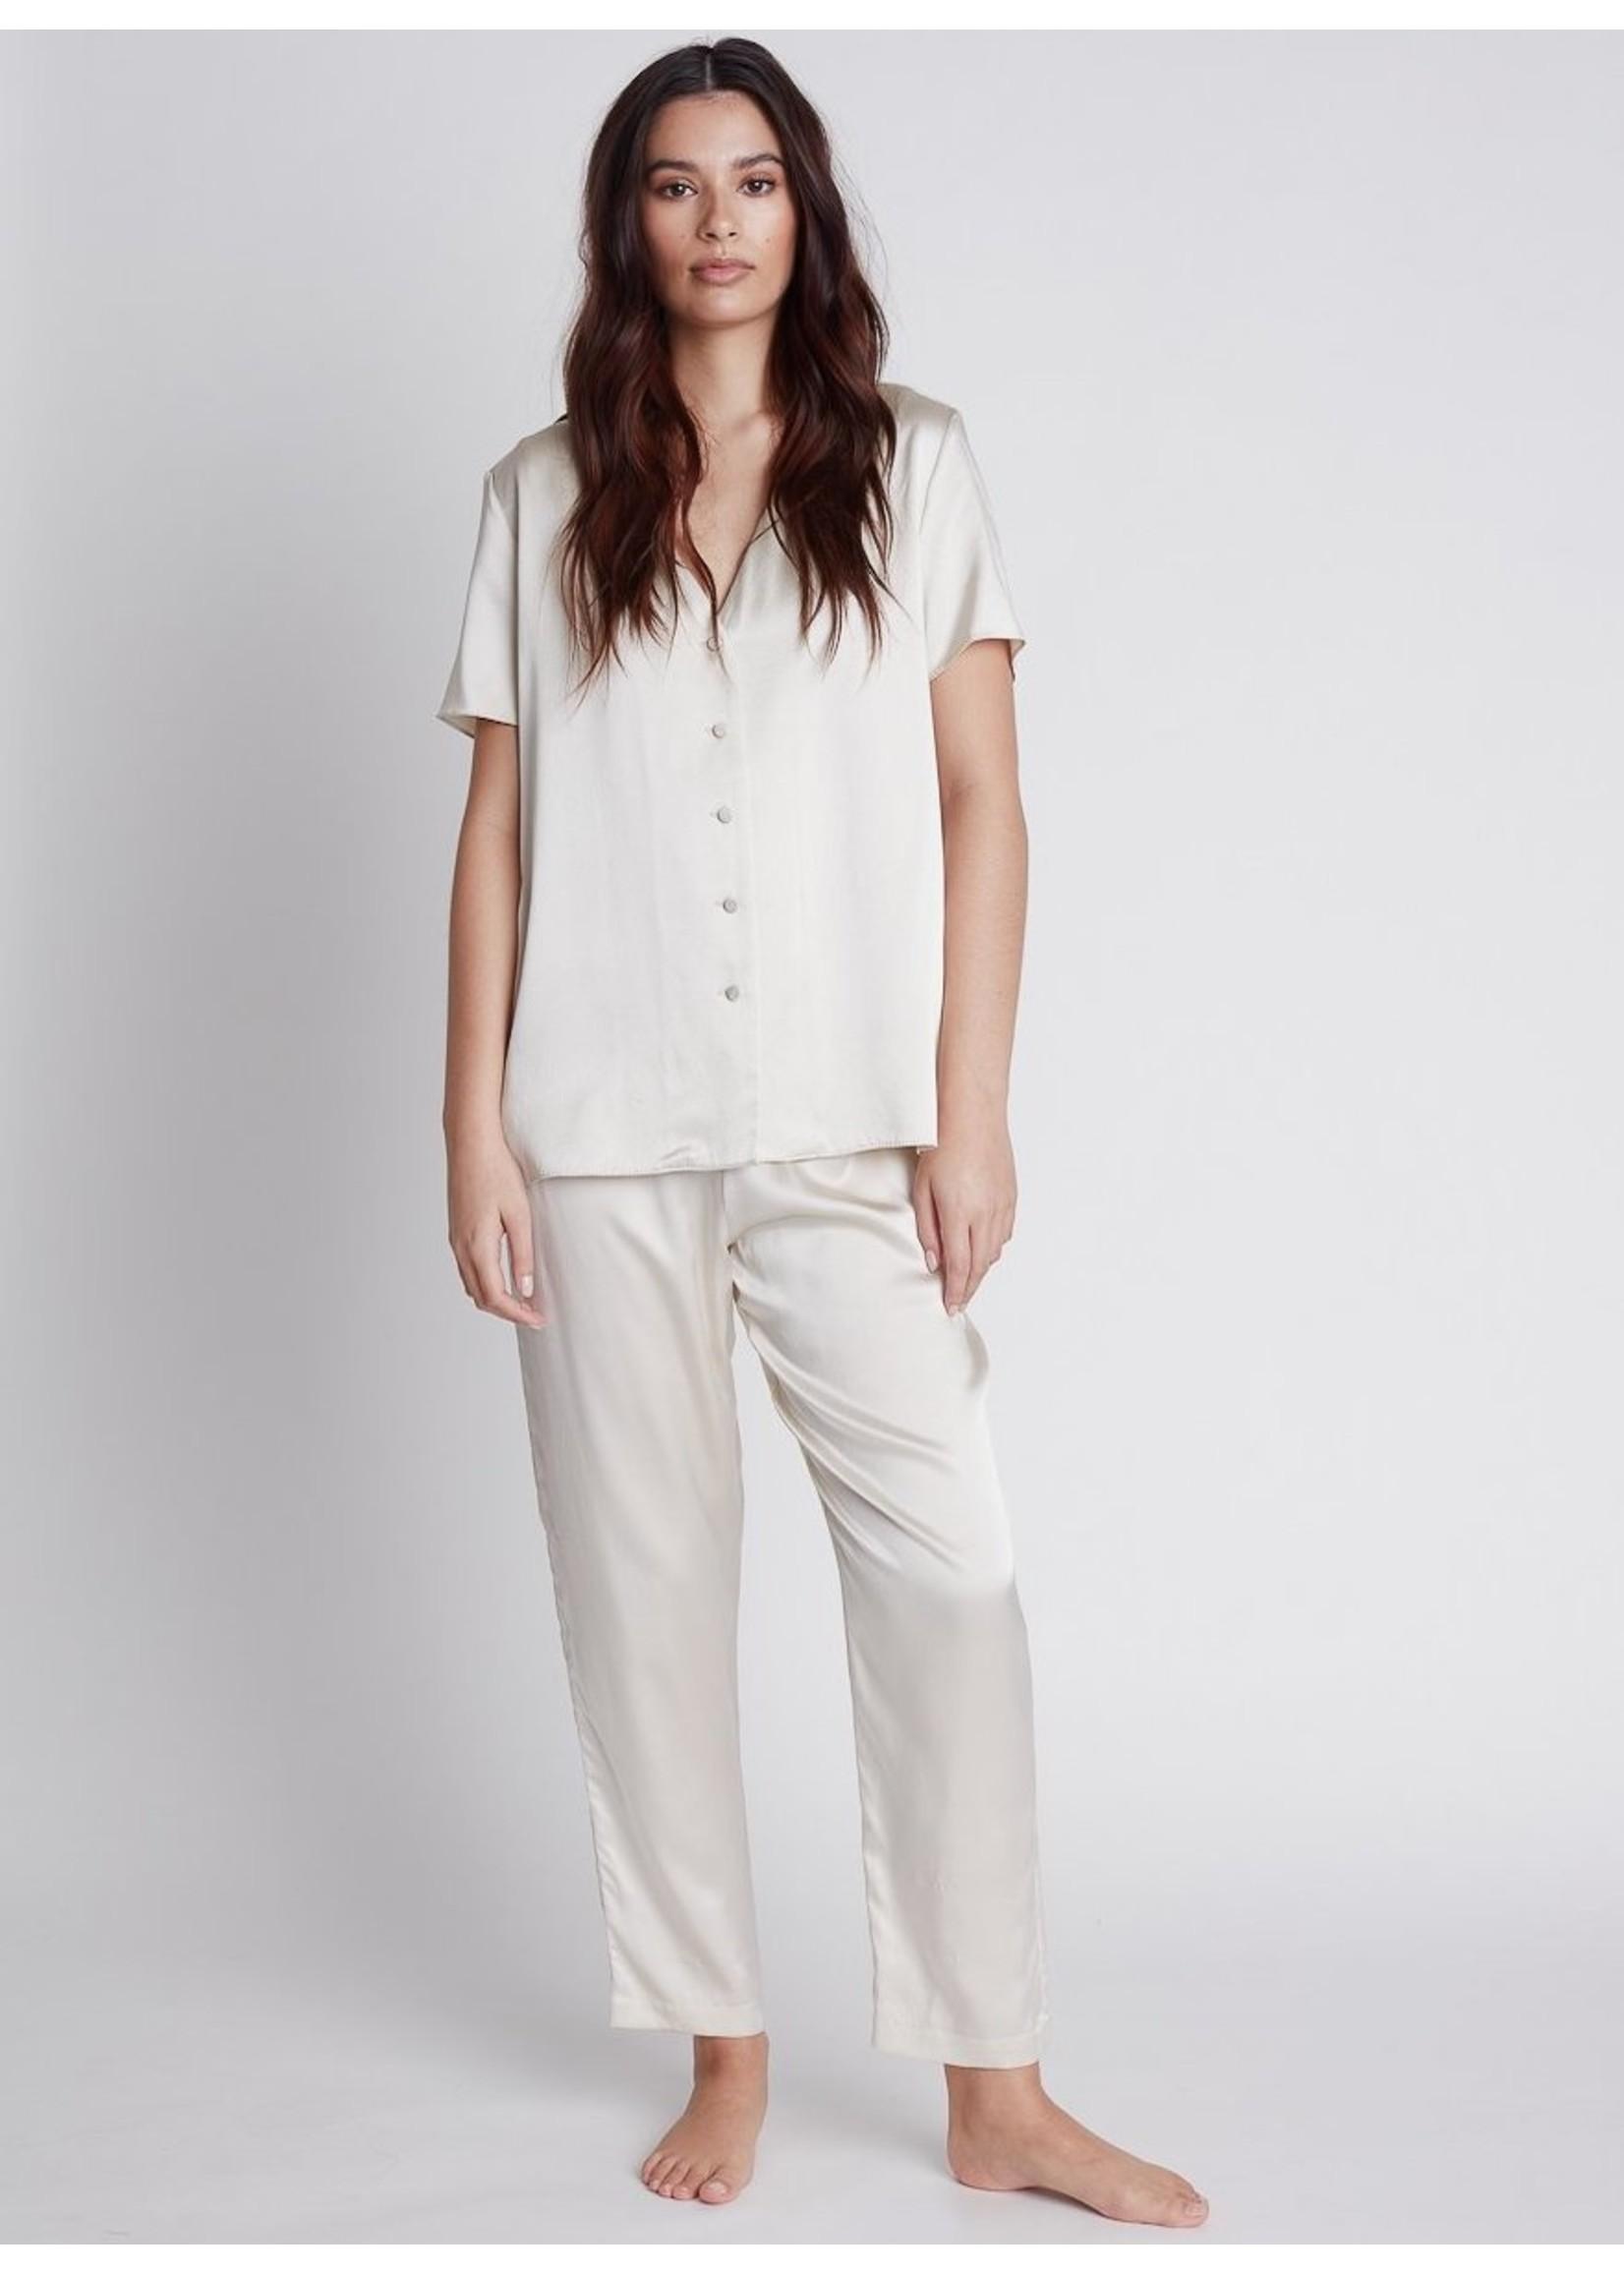 Nileta Silk Short Sleeve Button Ups